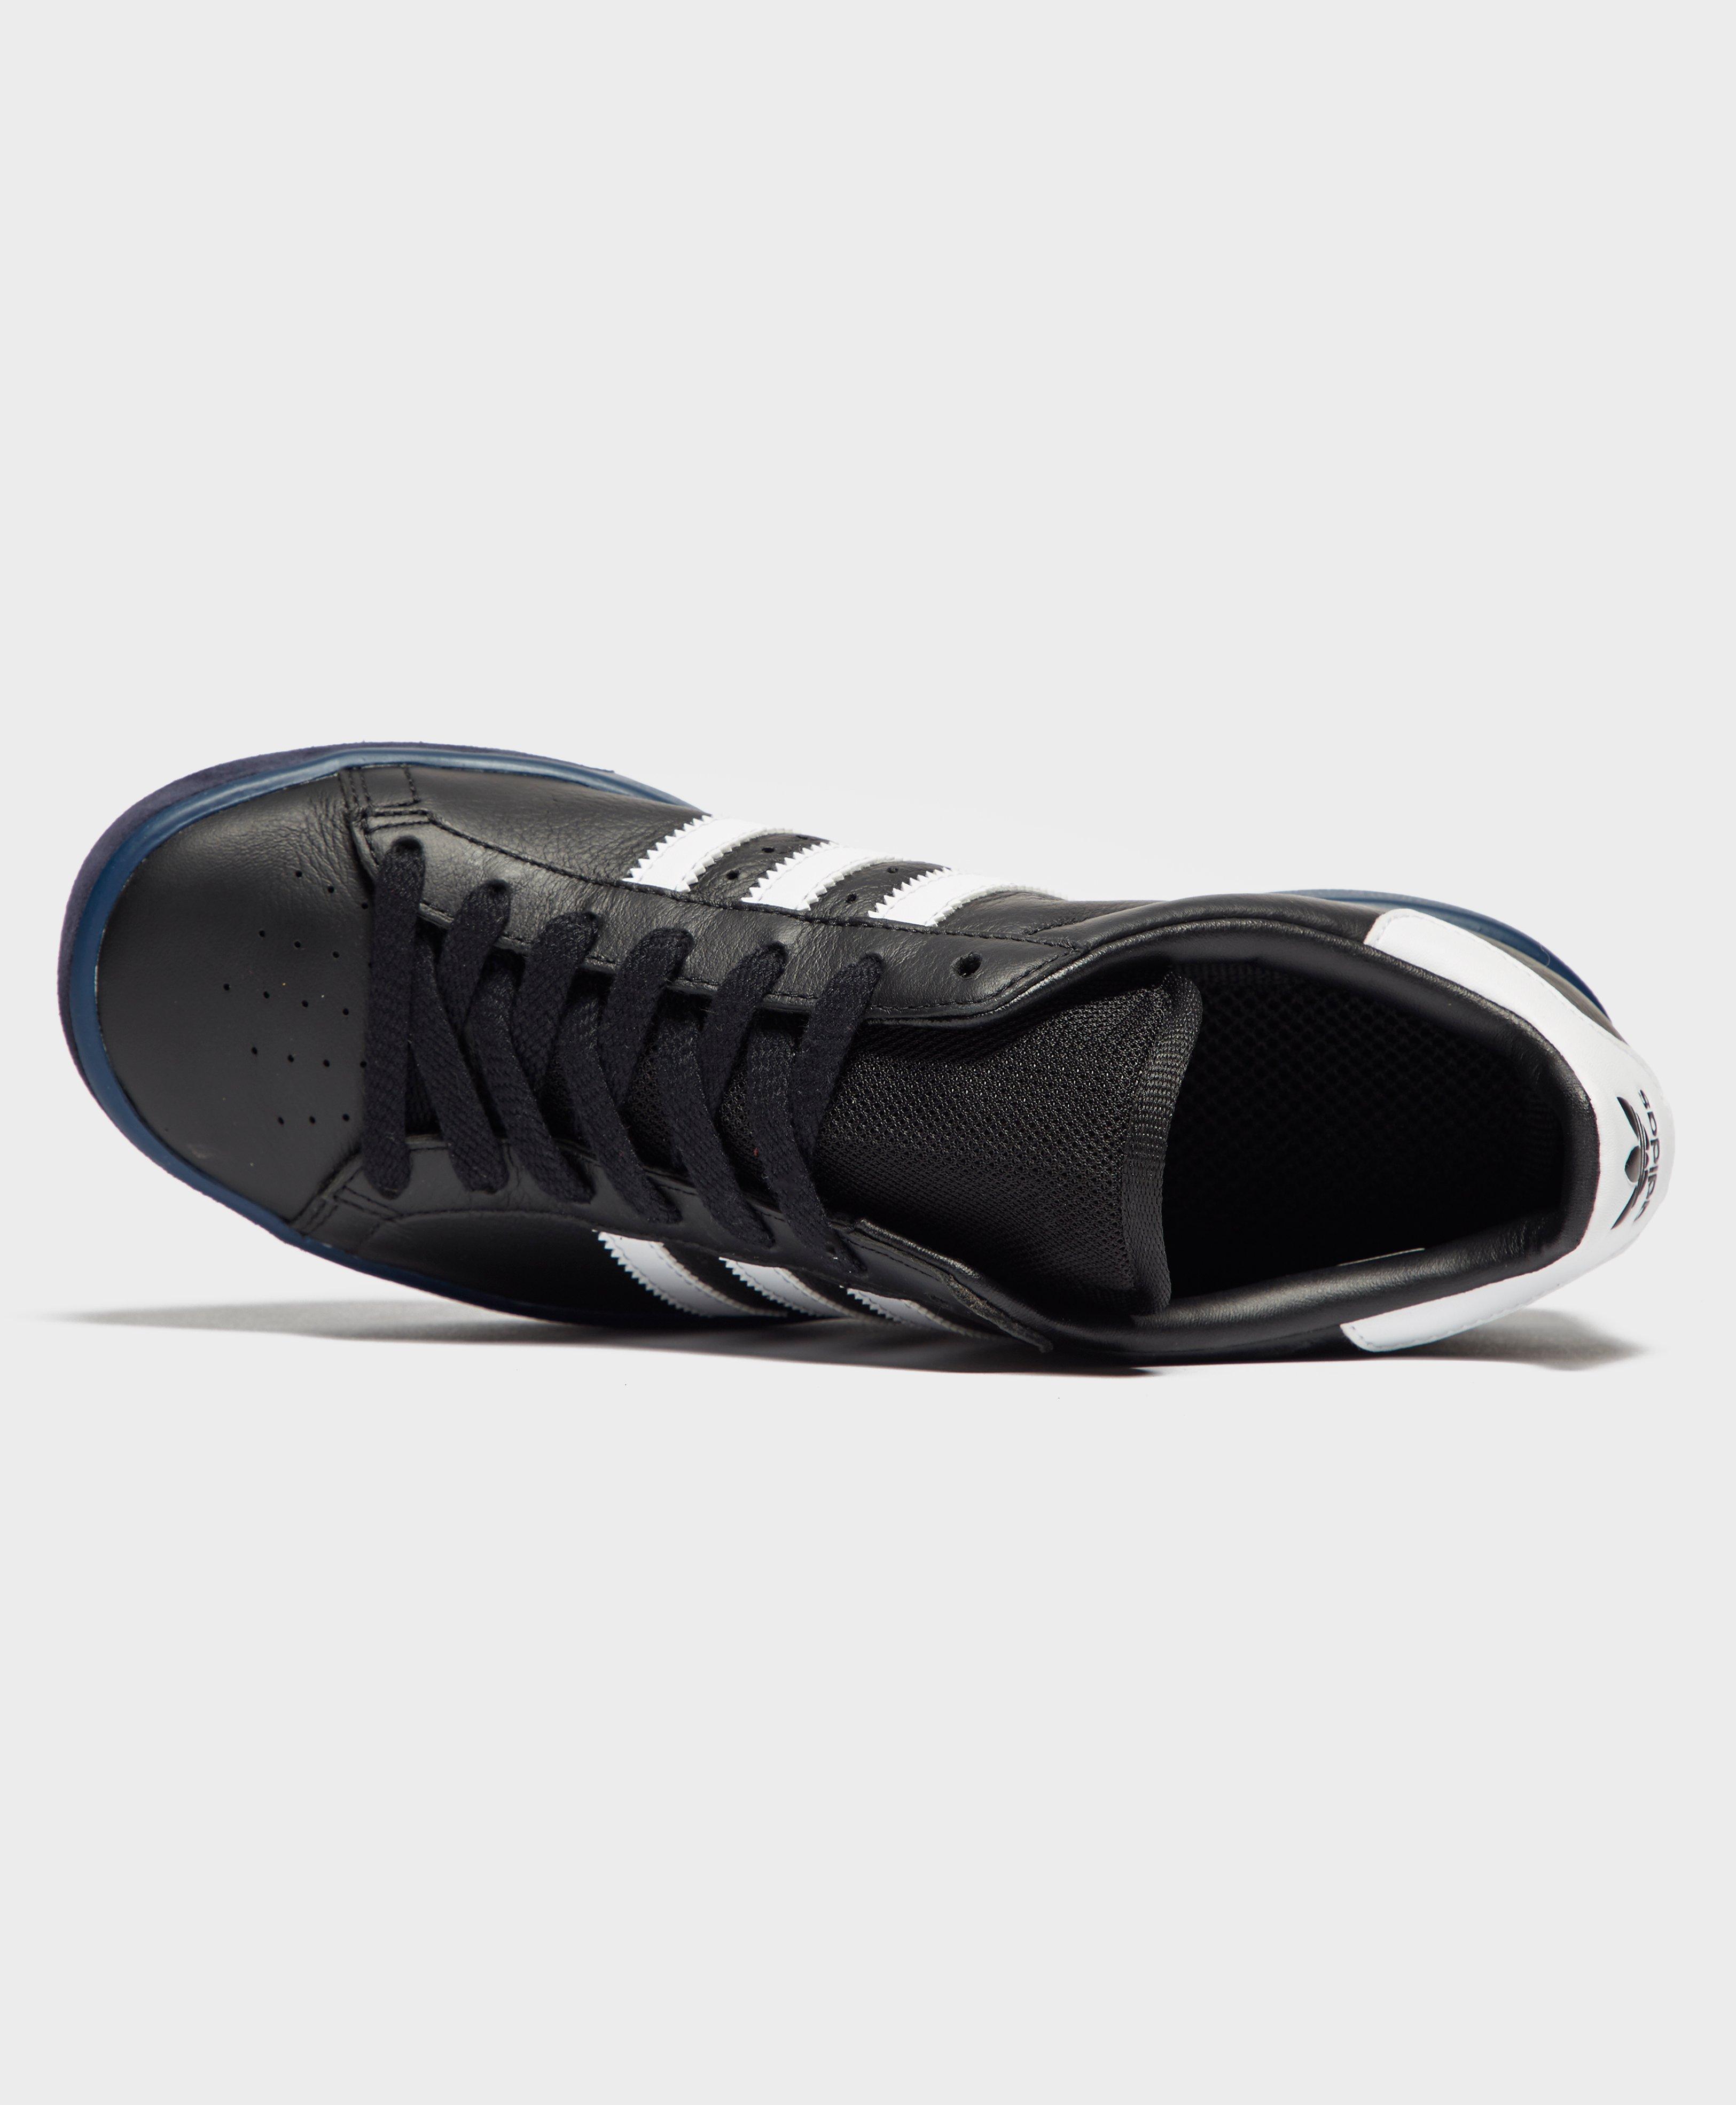 huge discount c9420 a7c07 Adidas Originals - Blue Forest Hills for Men - Lyst. View fullscreen